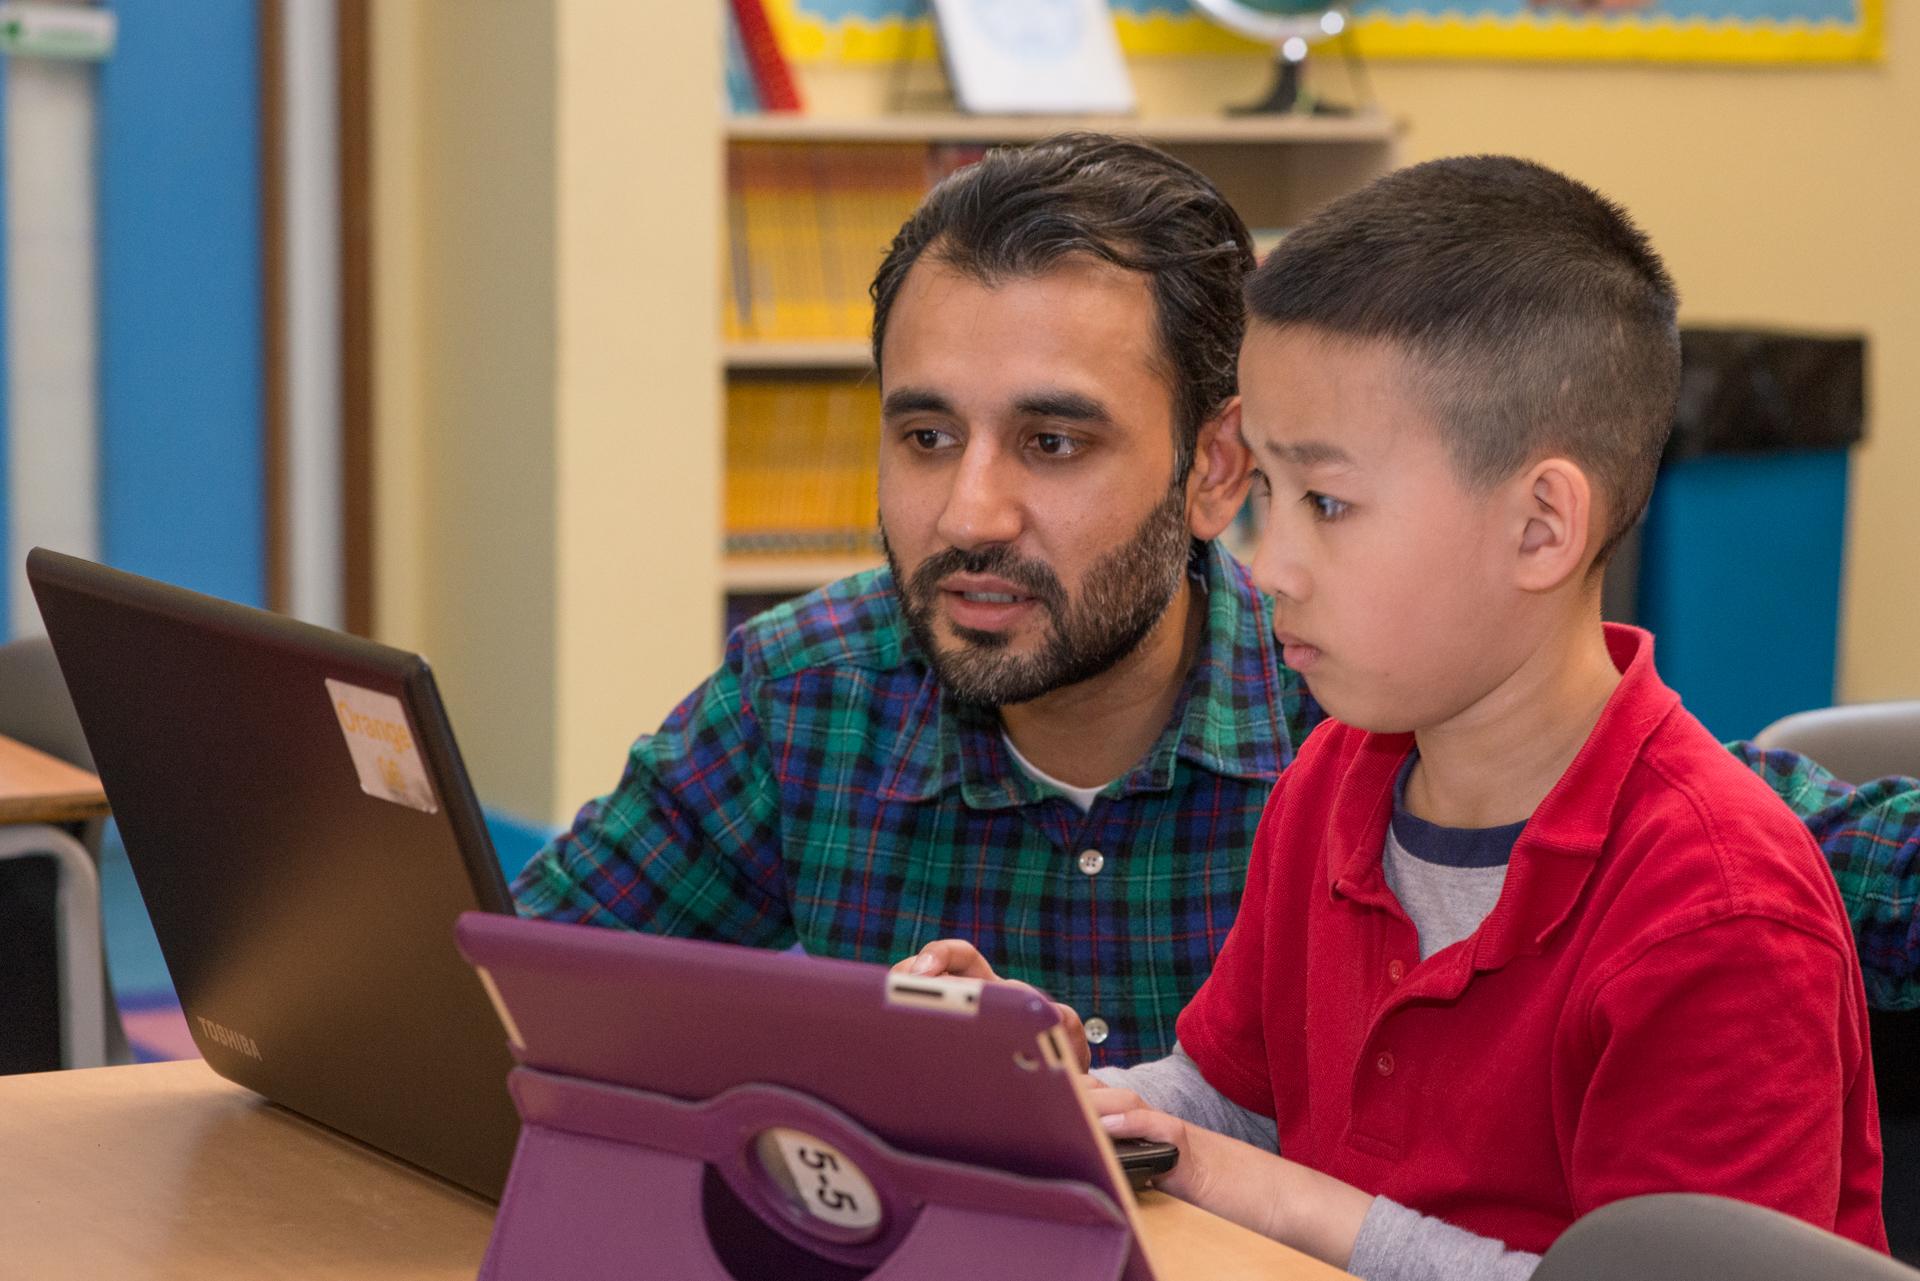 essay children learn best observing behaviour adults copying essay children learn best observing behaviour adults copying